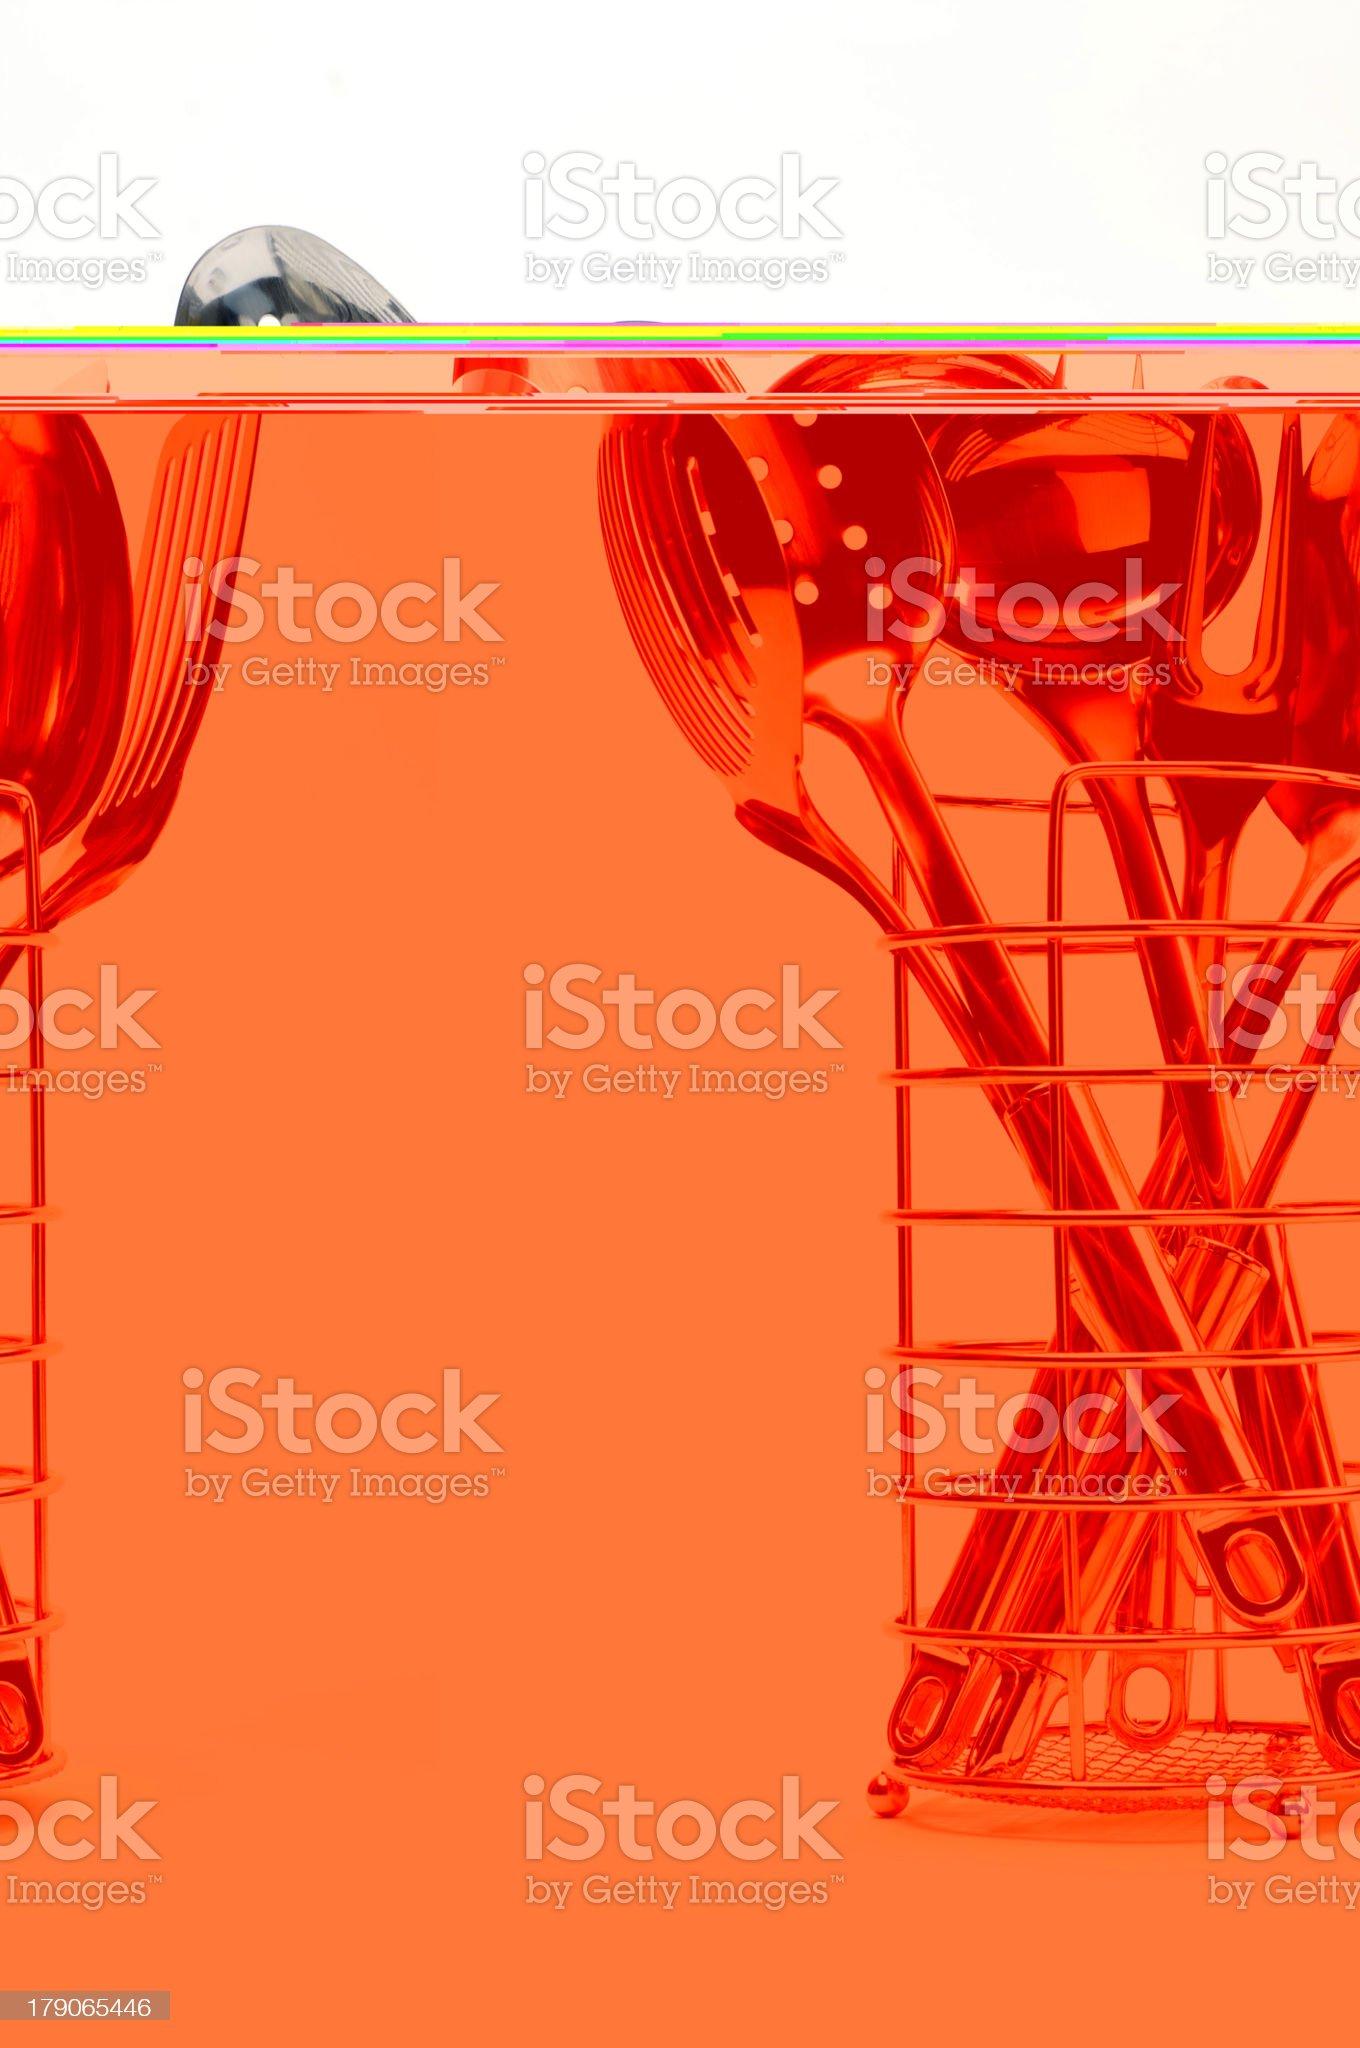 Illustration of chefs utensils royalty-free stock photo